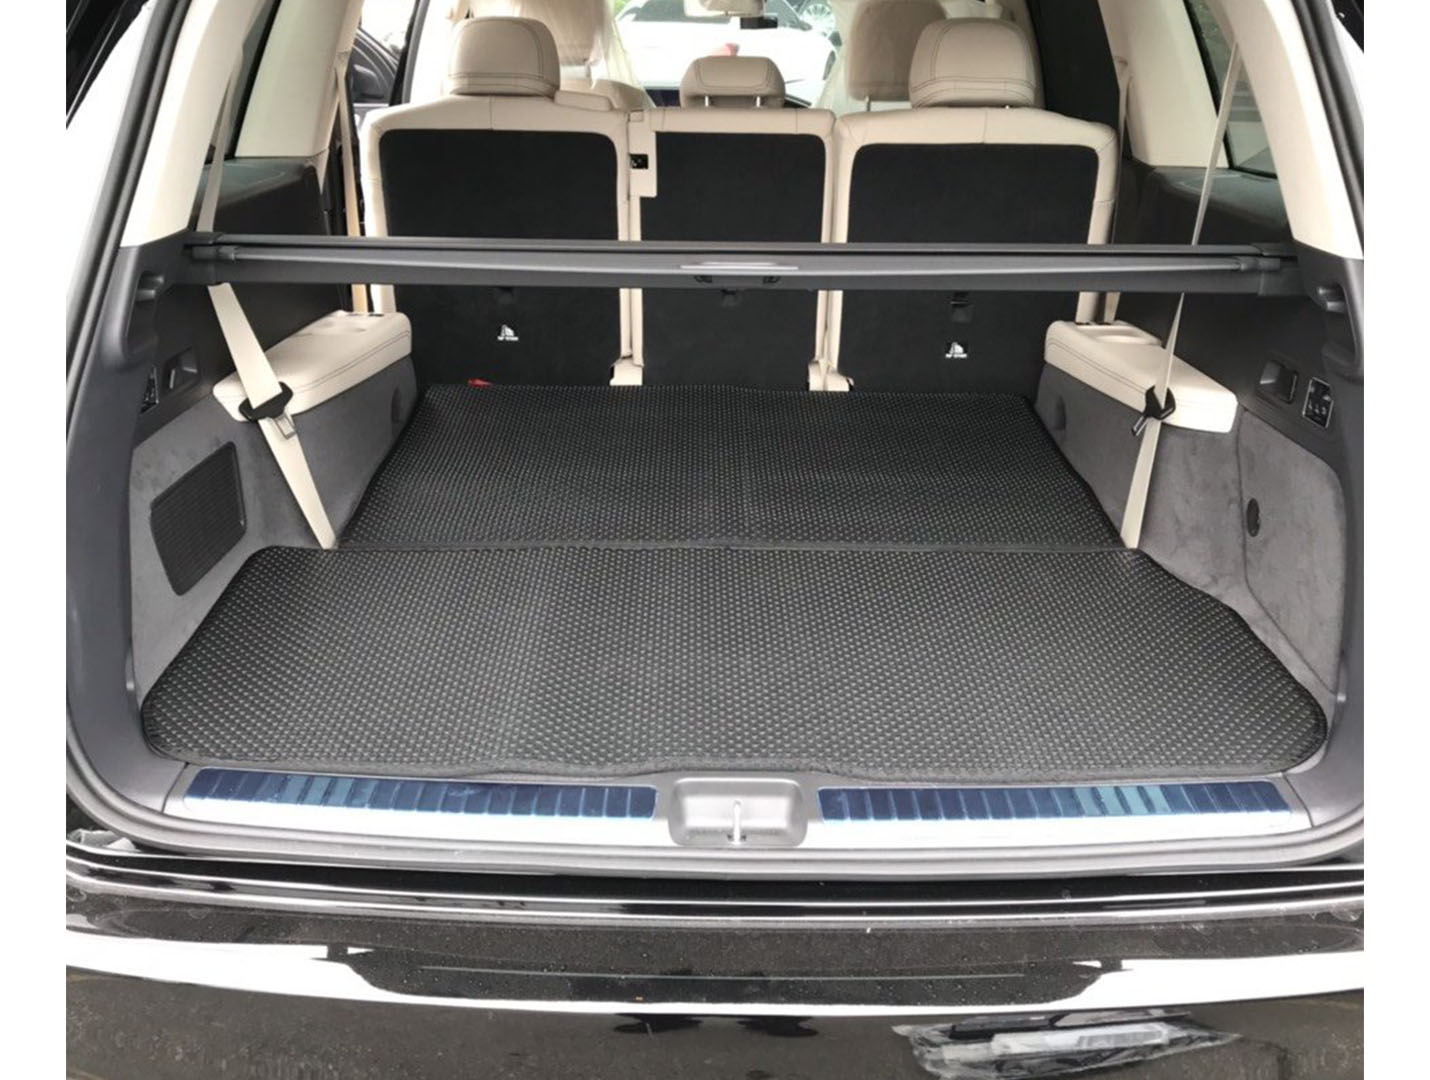 Thảm lót cốp Mercedes GLS 2020